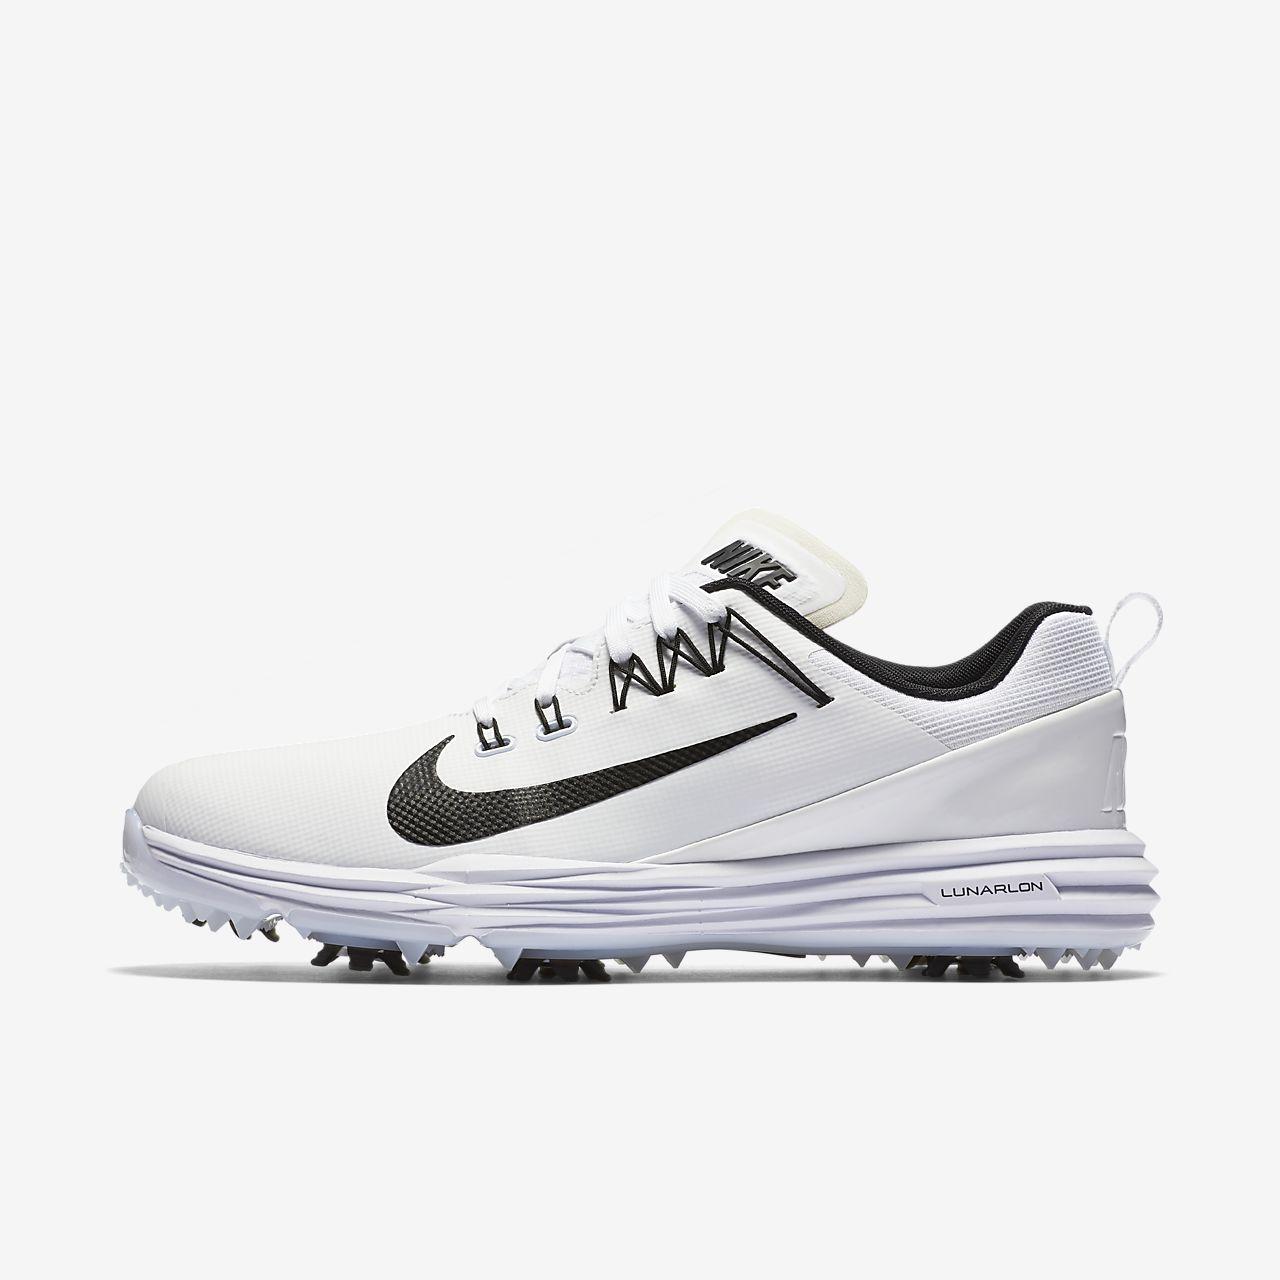 Nike Lunar Command 2 White White Black 880120100